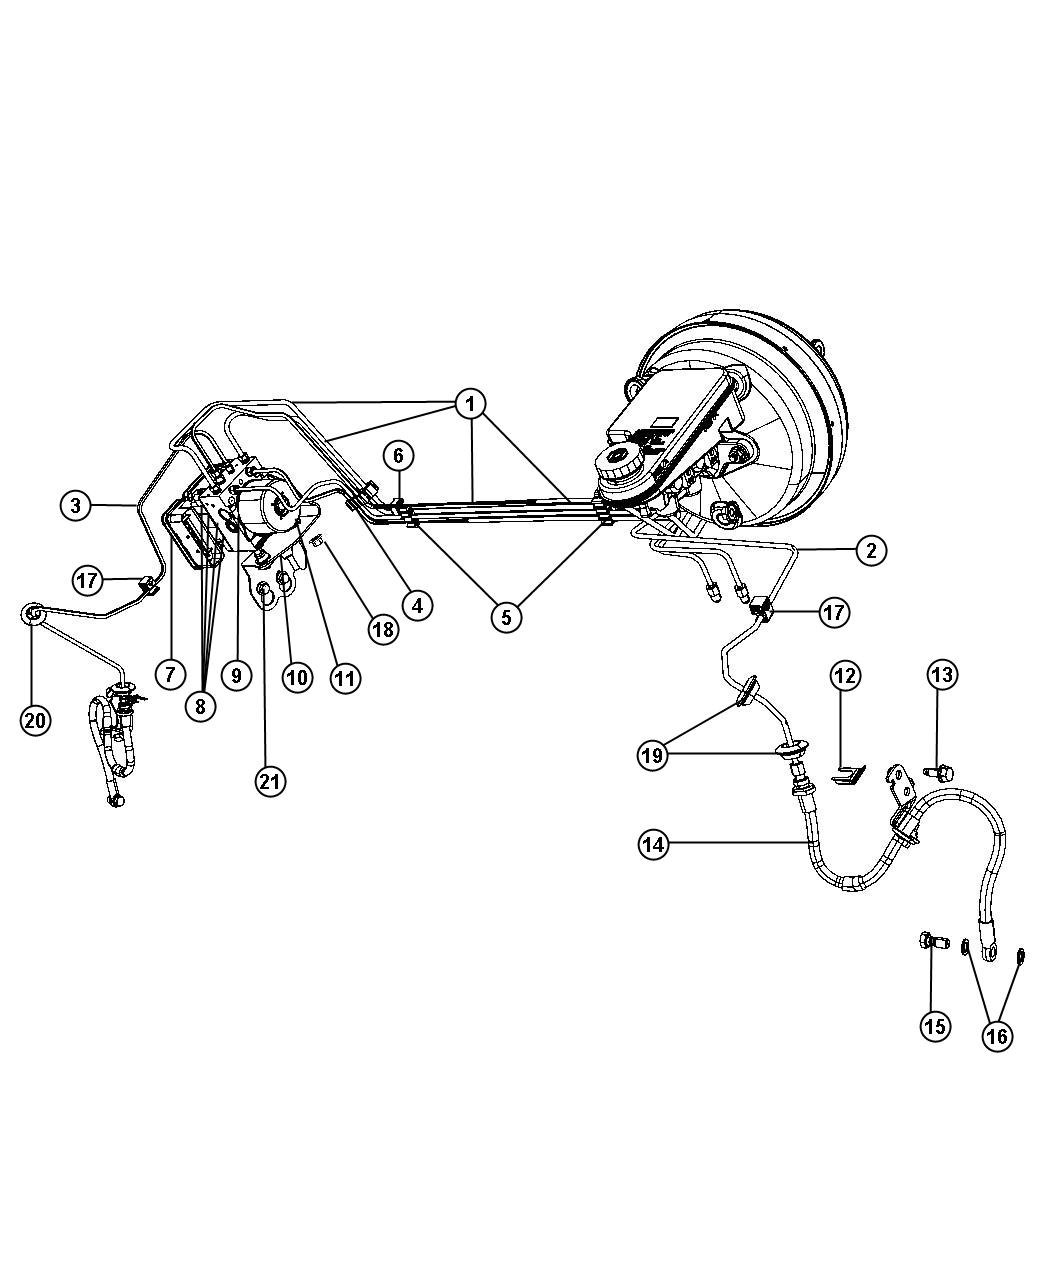 2011 Dodge Journey Hydraulic control unit. Anti-lock brake